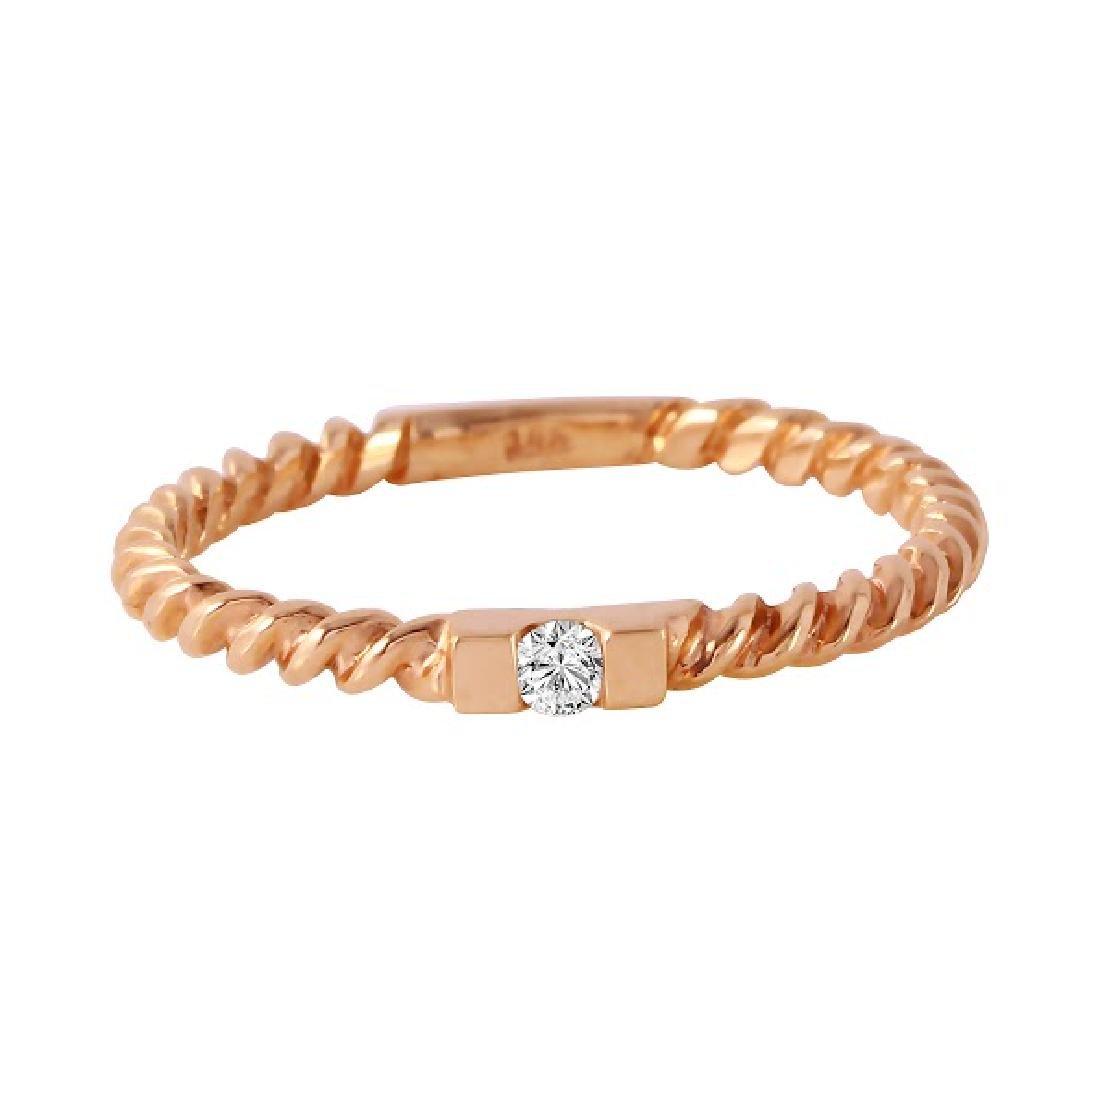 0.04 Carat Natural Diamond 18K Solid Rose Gold Ring - 2